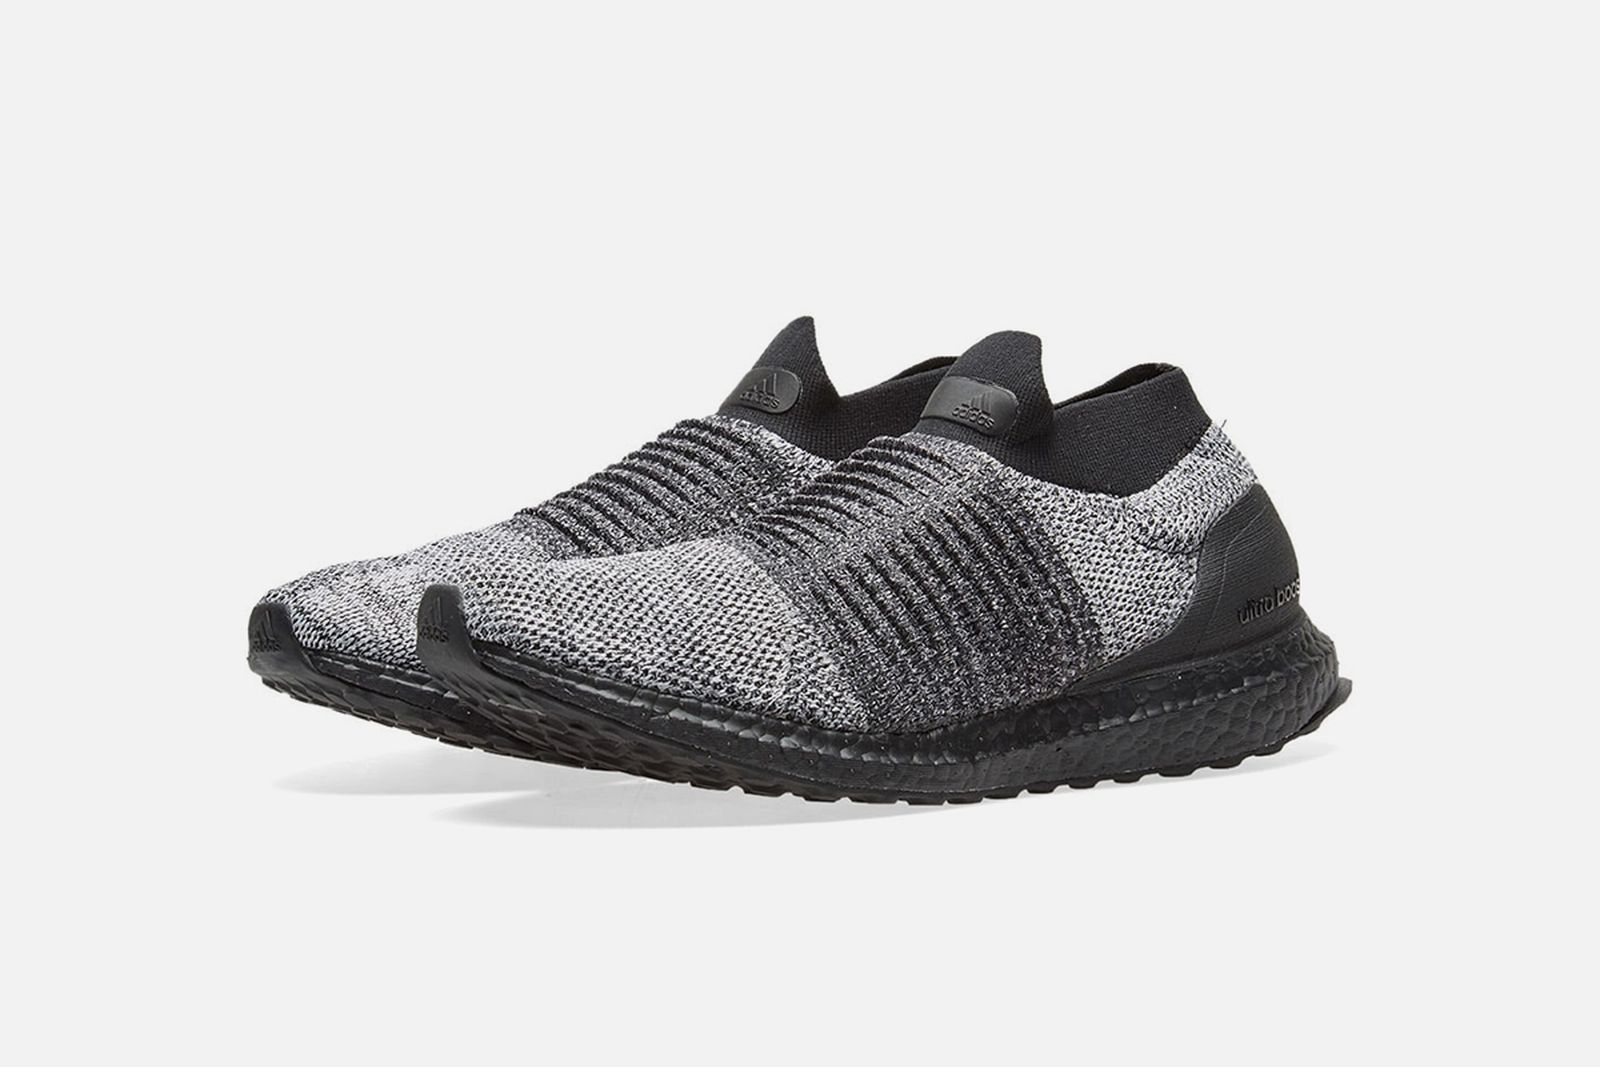 05 02 2018 adidas ultraboostlaceless black white bb6137 mo 1 Margiela Stüssy end